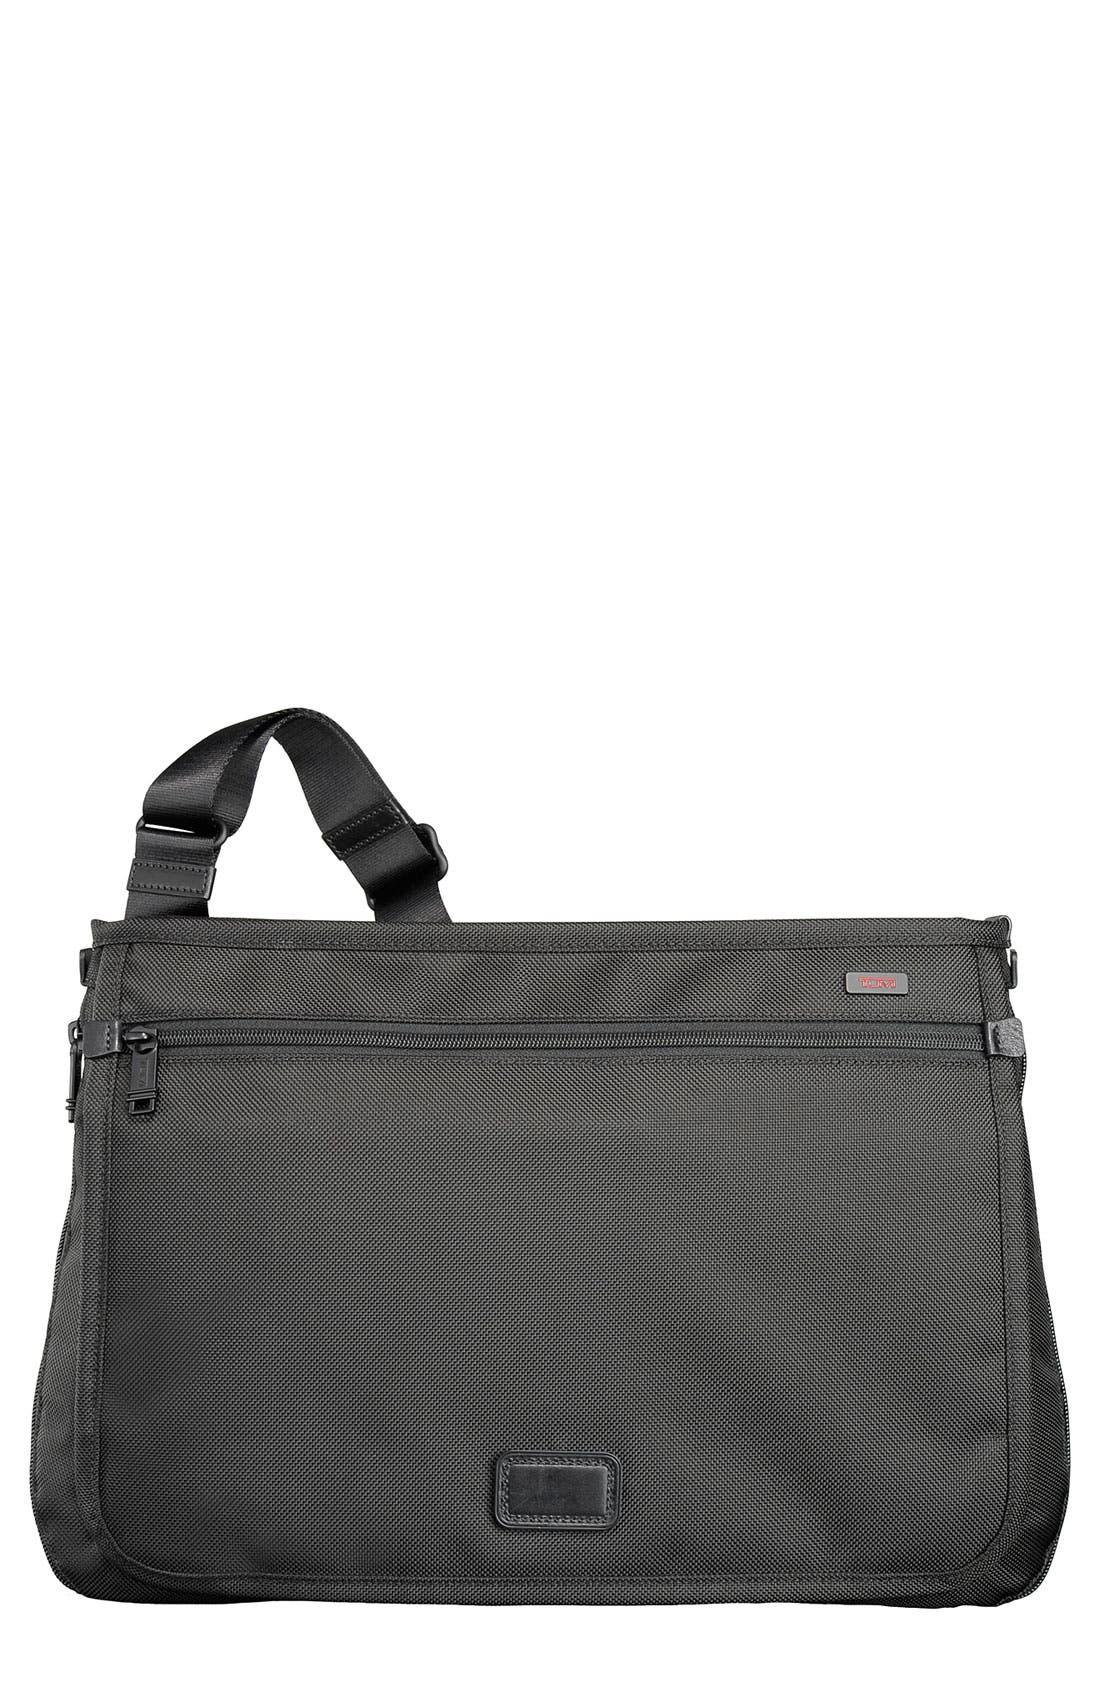 Alternate Image 1 Selected - Tumi 'Alpha' Slim Messenger Bag